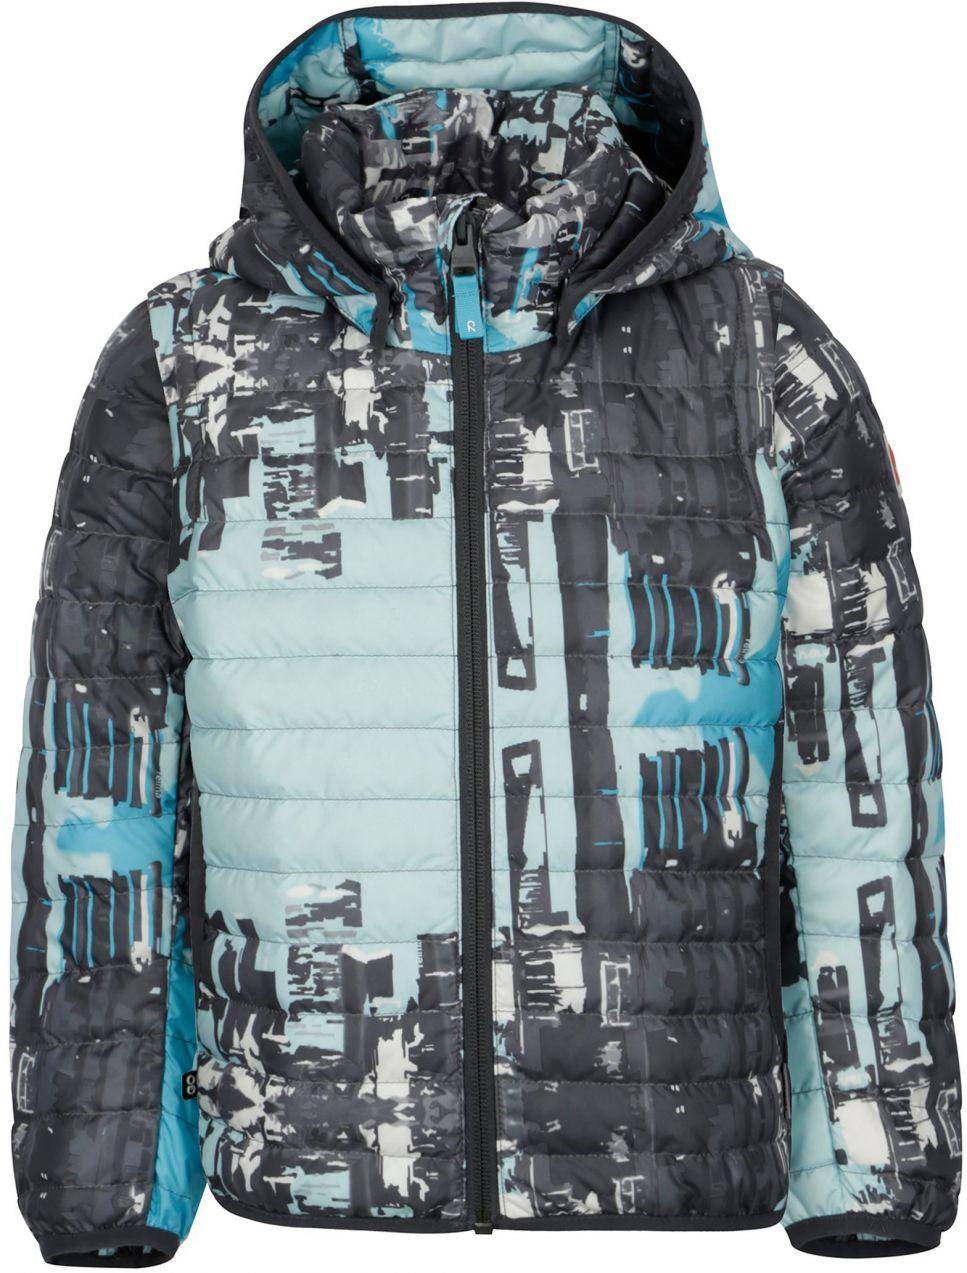 faac2ee8ce1e7 Modro–sivá chlapčenská prešívaná páperová bunda s odnímateľnými rukávmi  Reima Fleet značky Reima - Lovely.sk